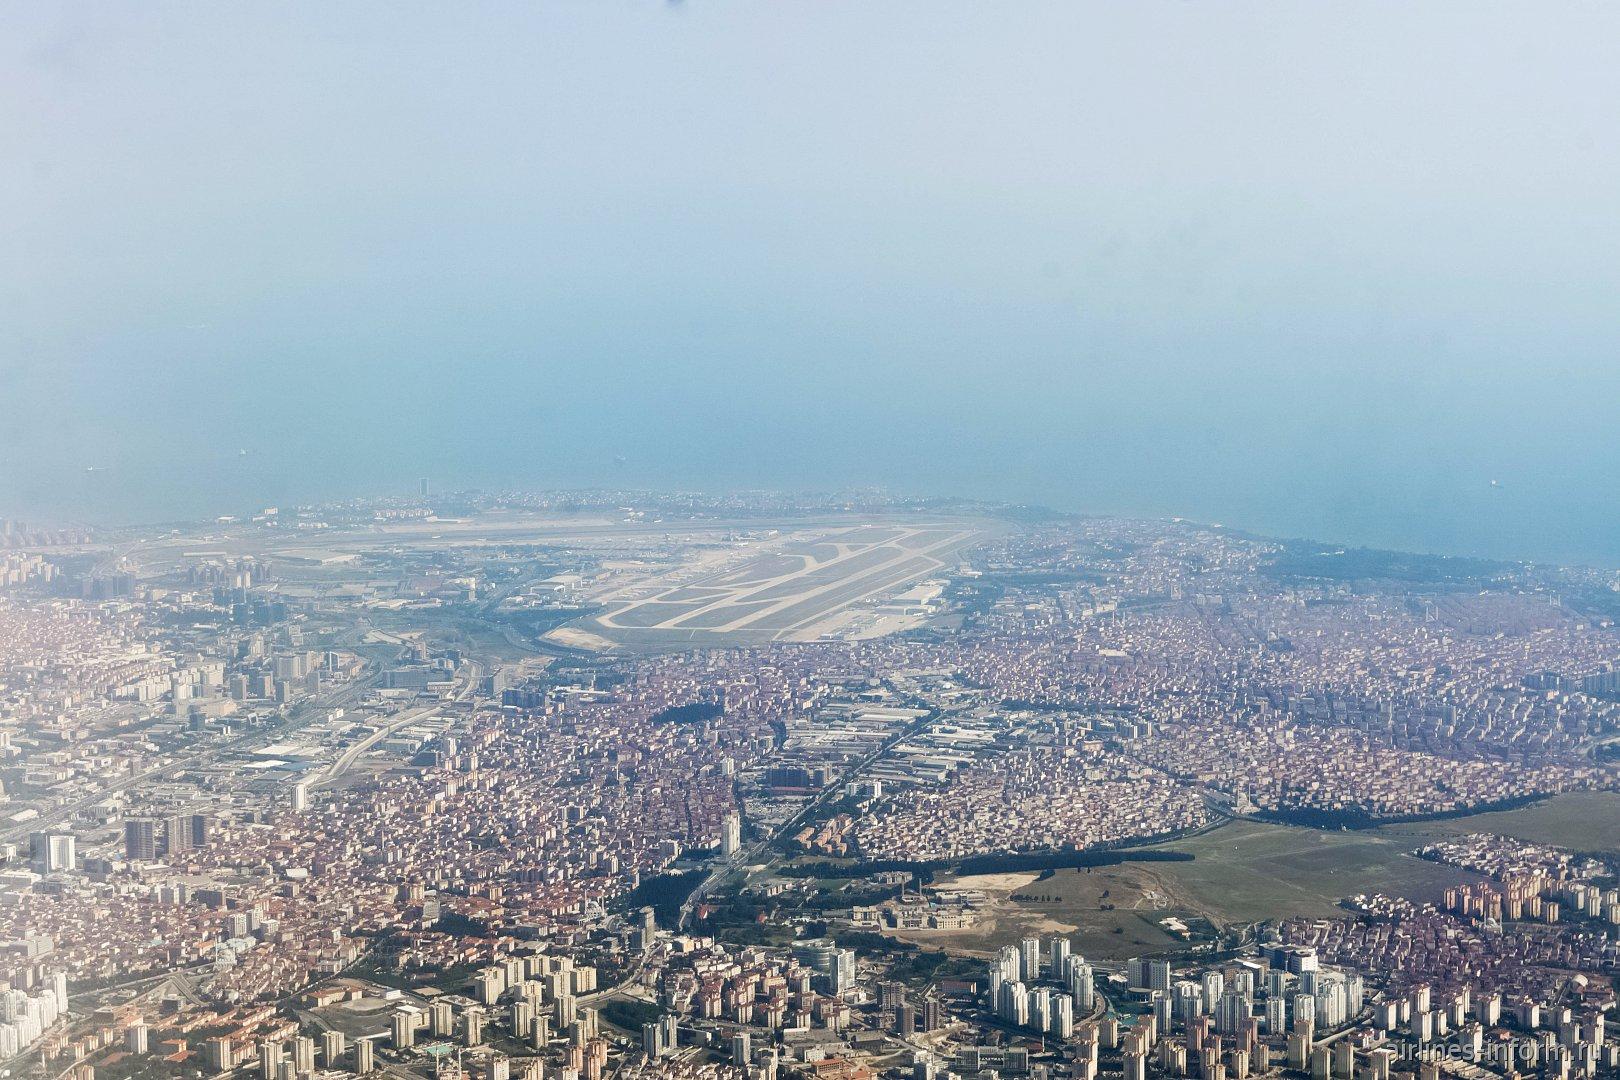 Вид на аэропорт Стамбул Ататюрк после взлета